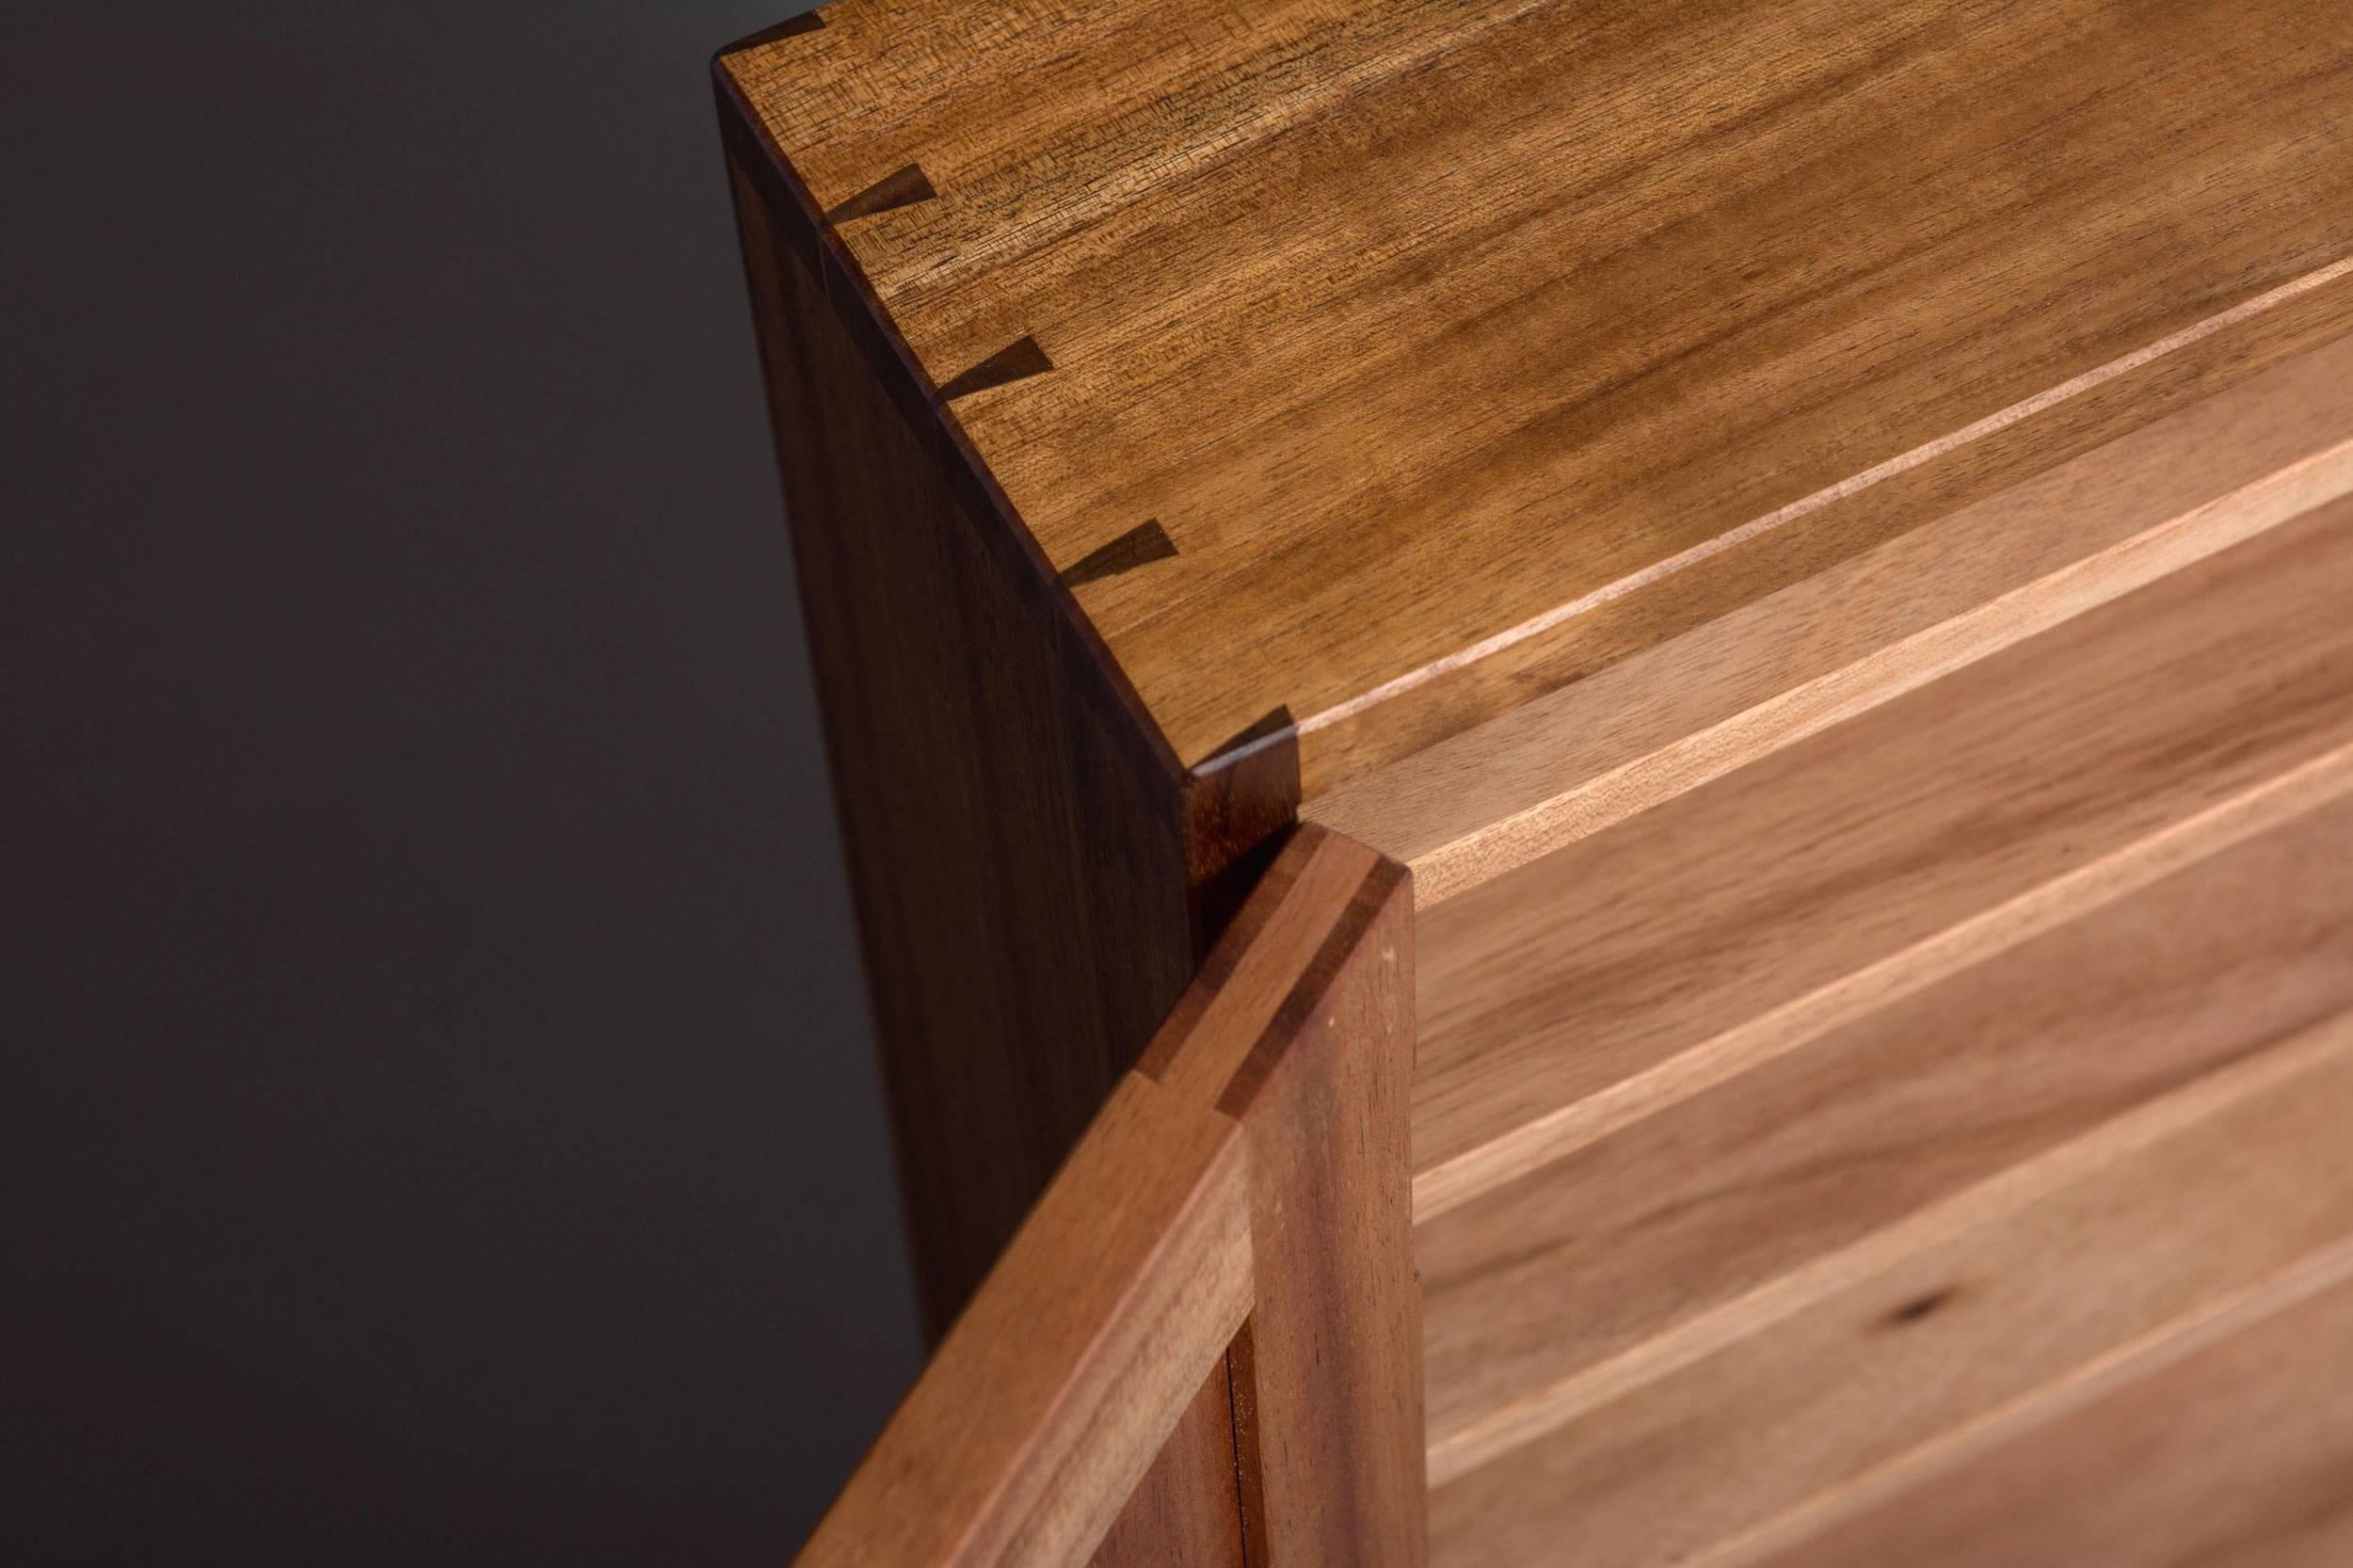 Blackwood Cabinet3 copy.jpg